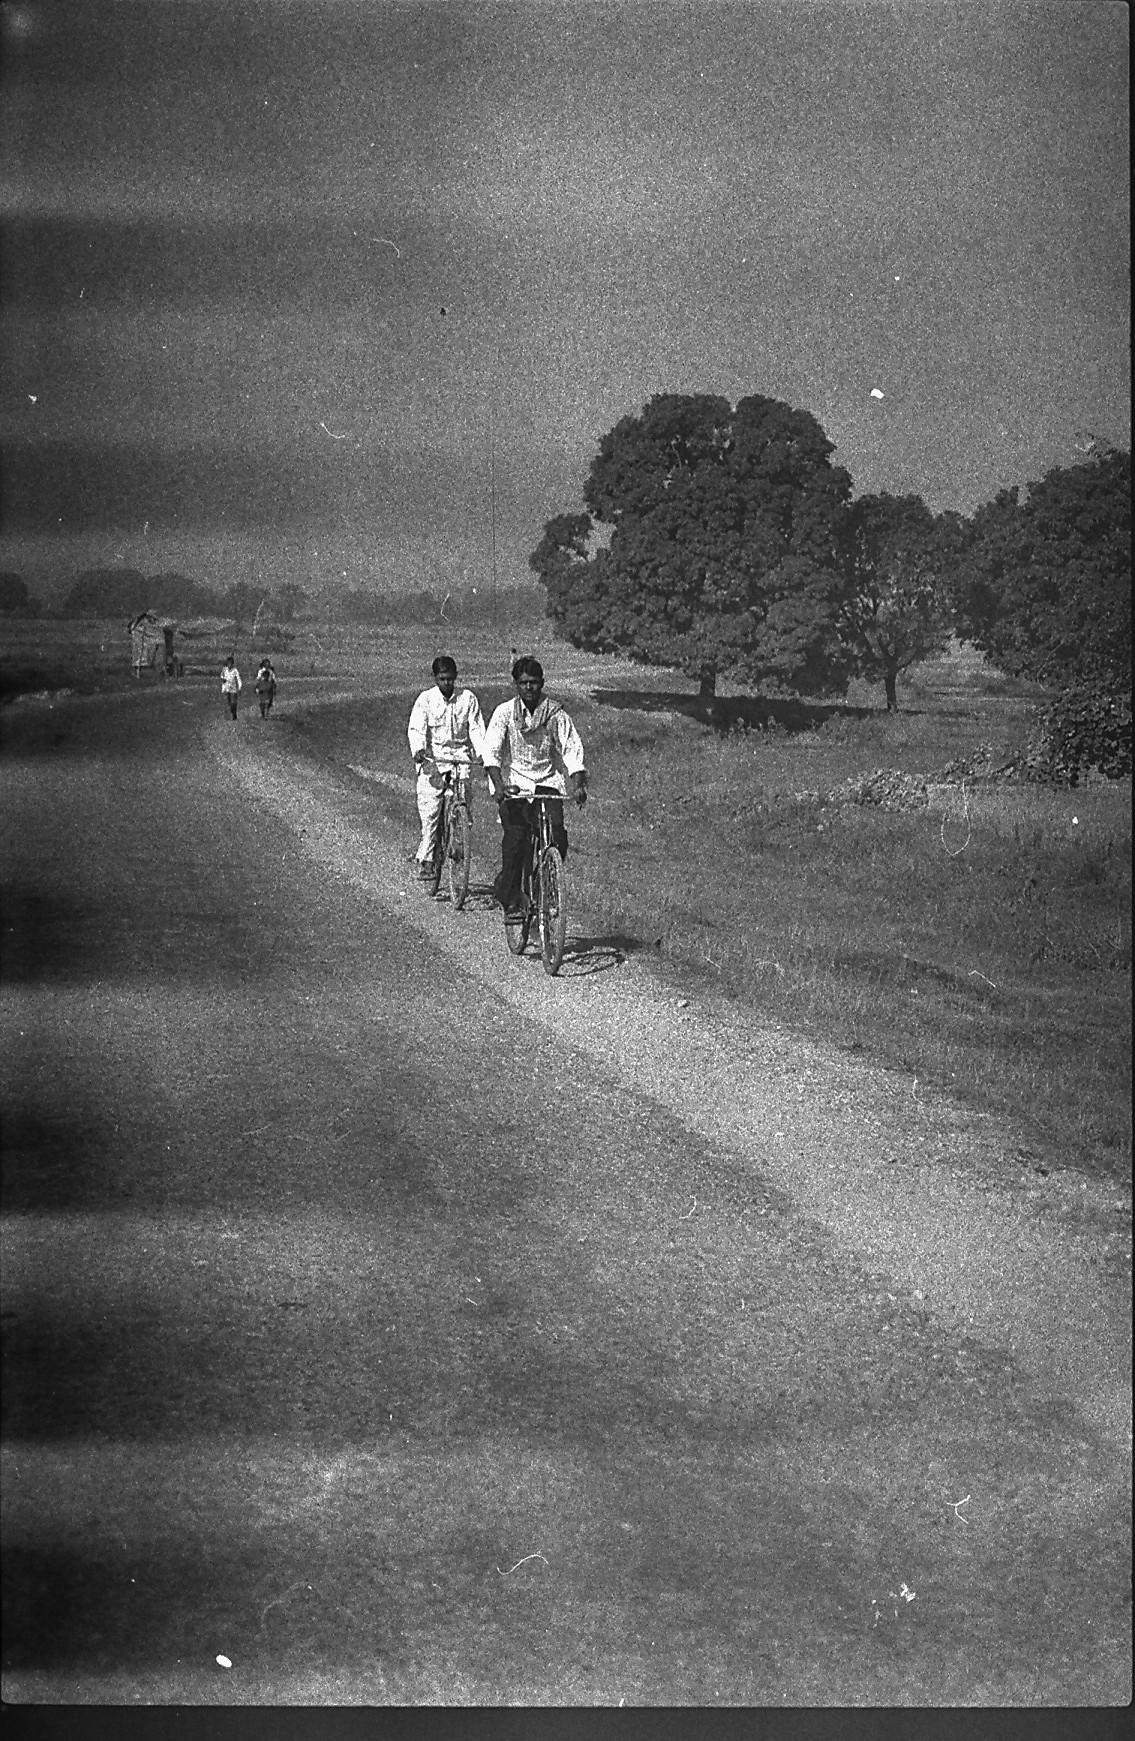 Nepal cyclists